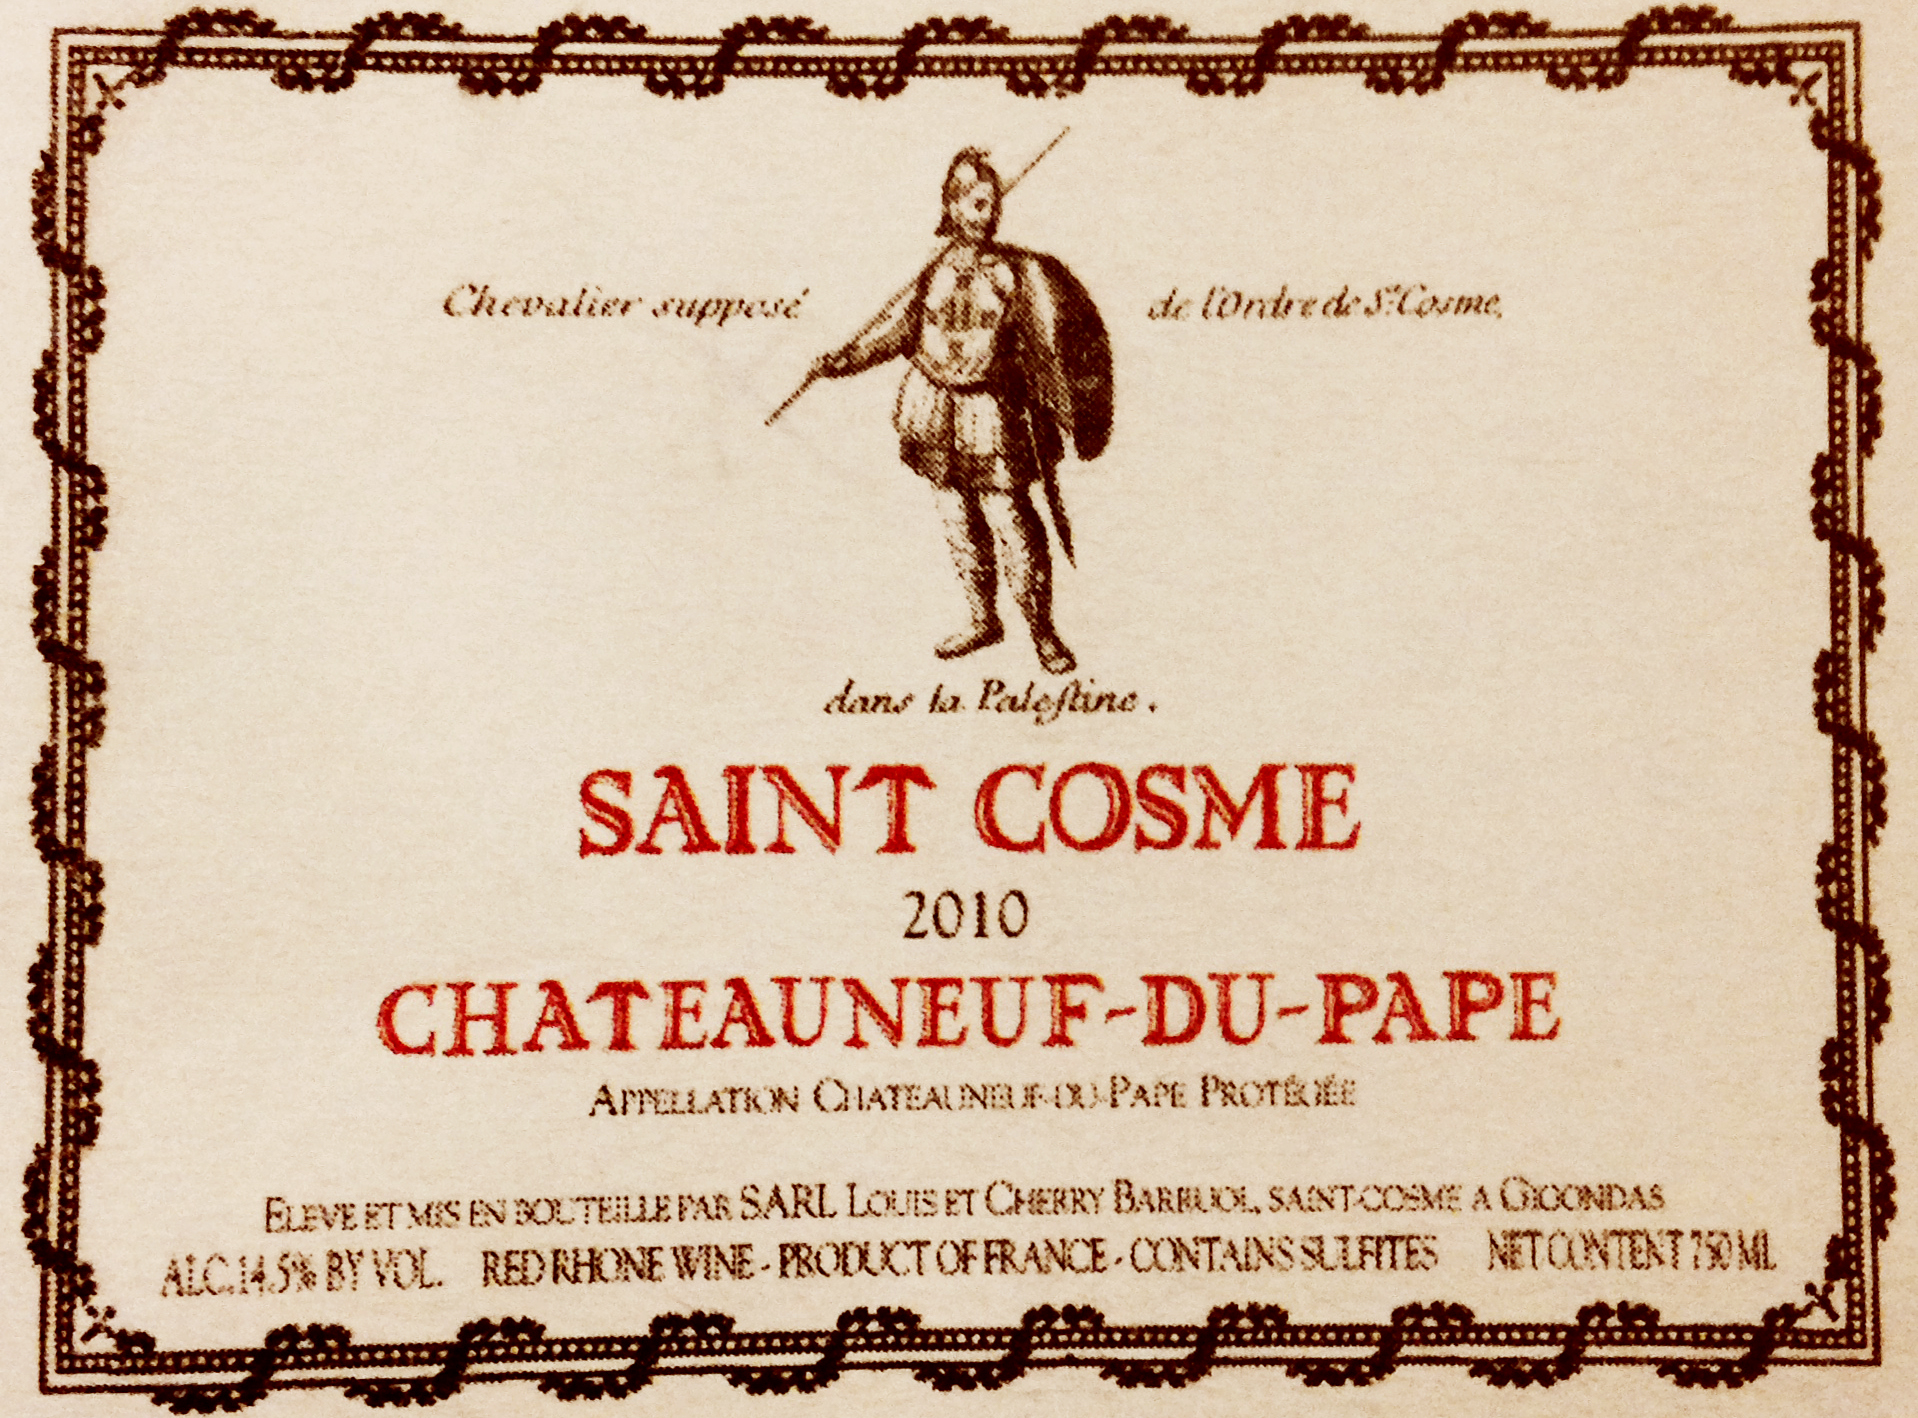 Saint Cosme Chateauneuf-du-Pape 2010, 3.jpg